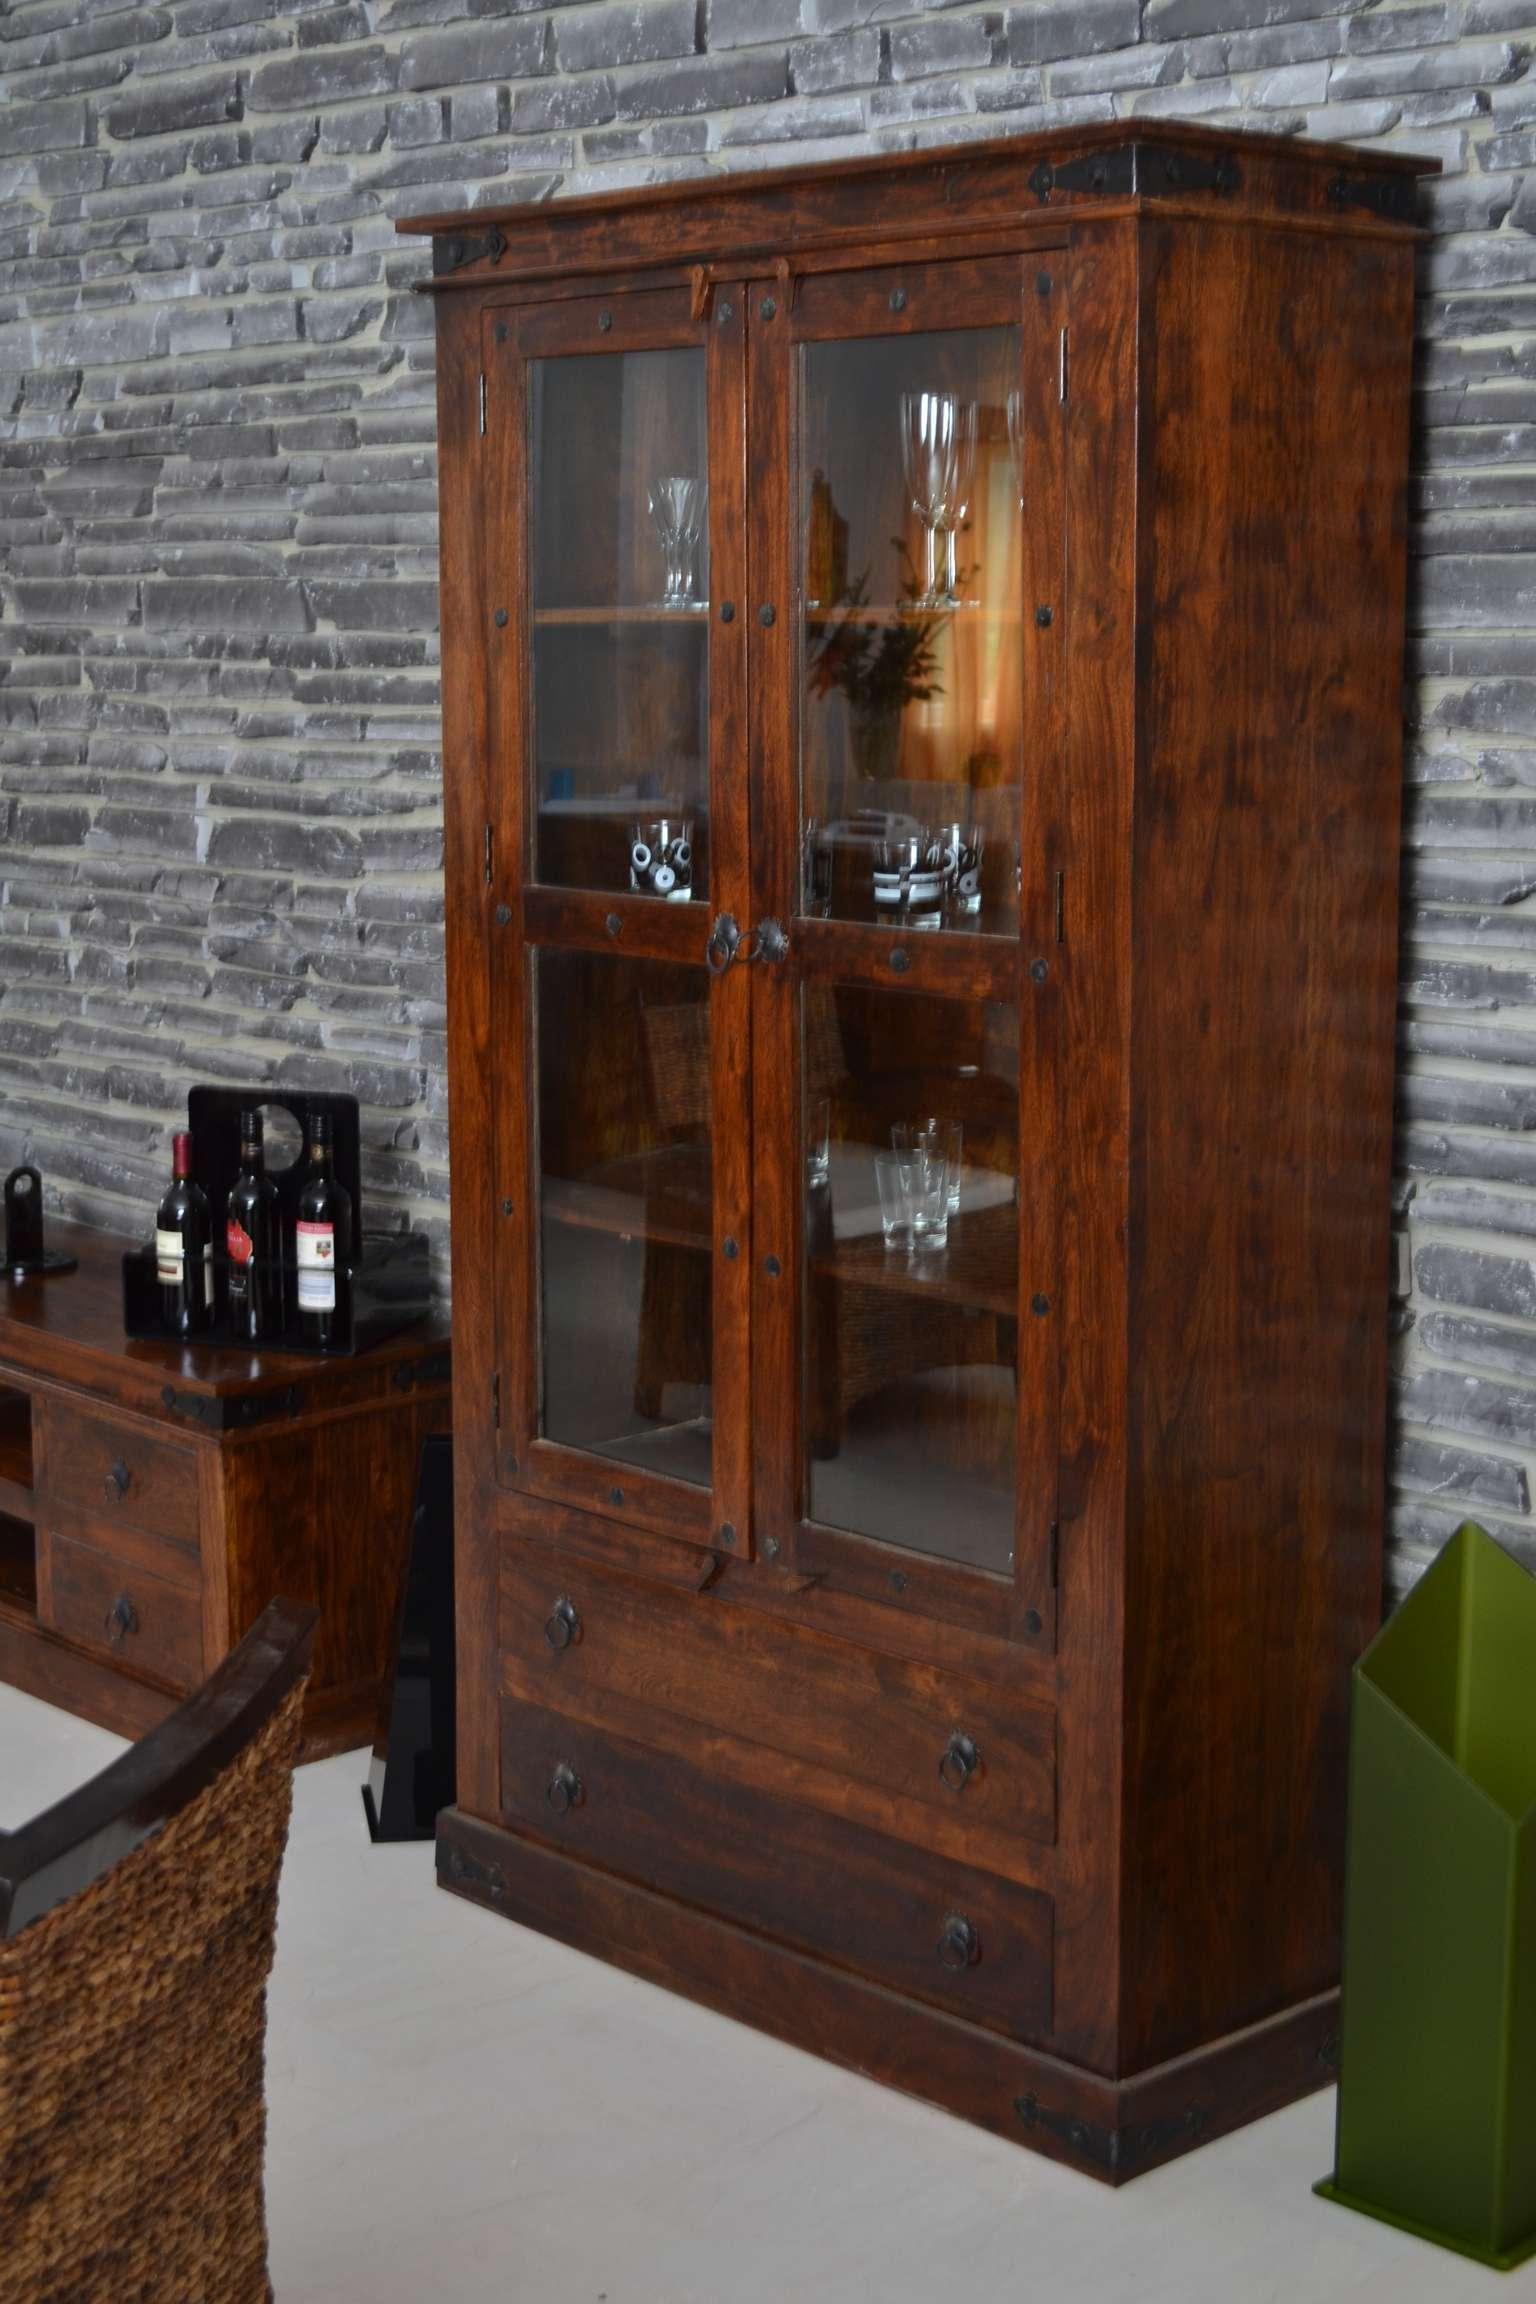 vitrine colombo 20530 massivholz m bel akazie walnu ebay. Black Bedroom Furniture Sets. Home Design Ideas